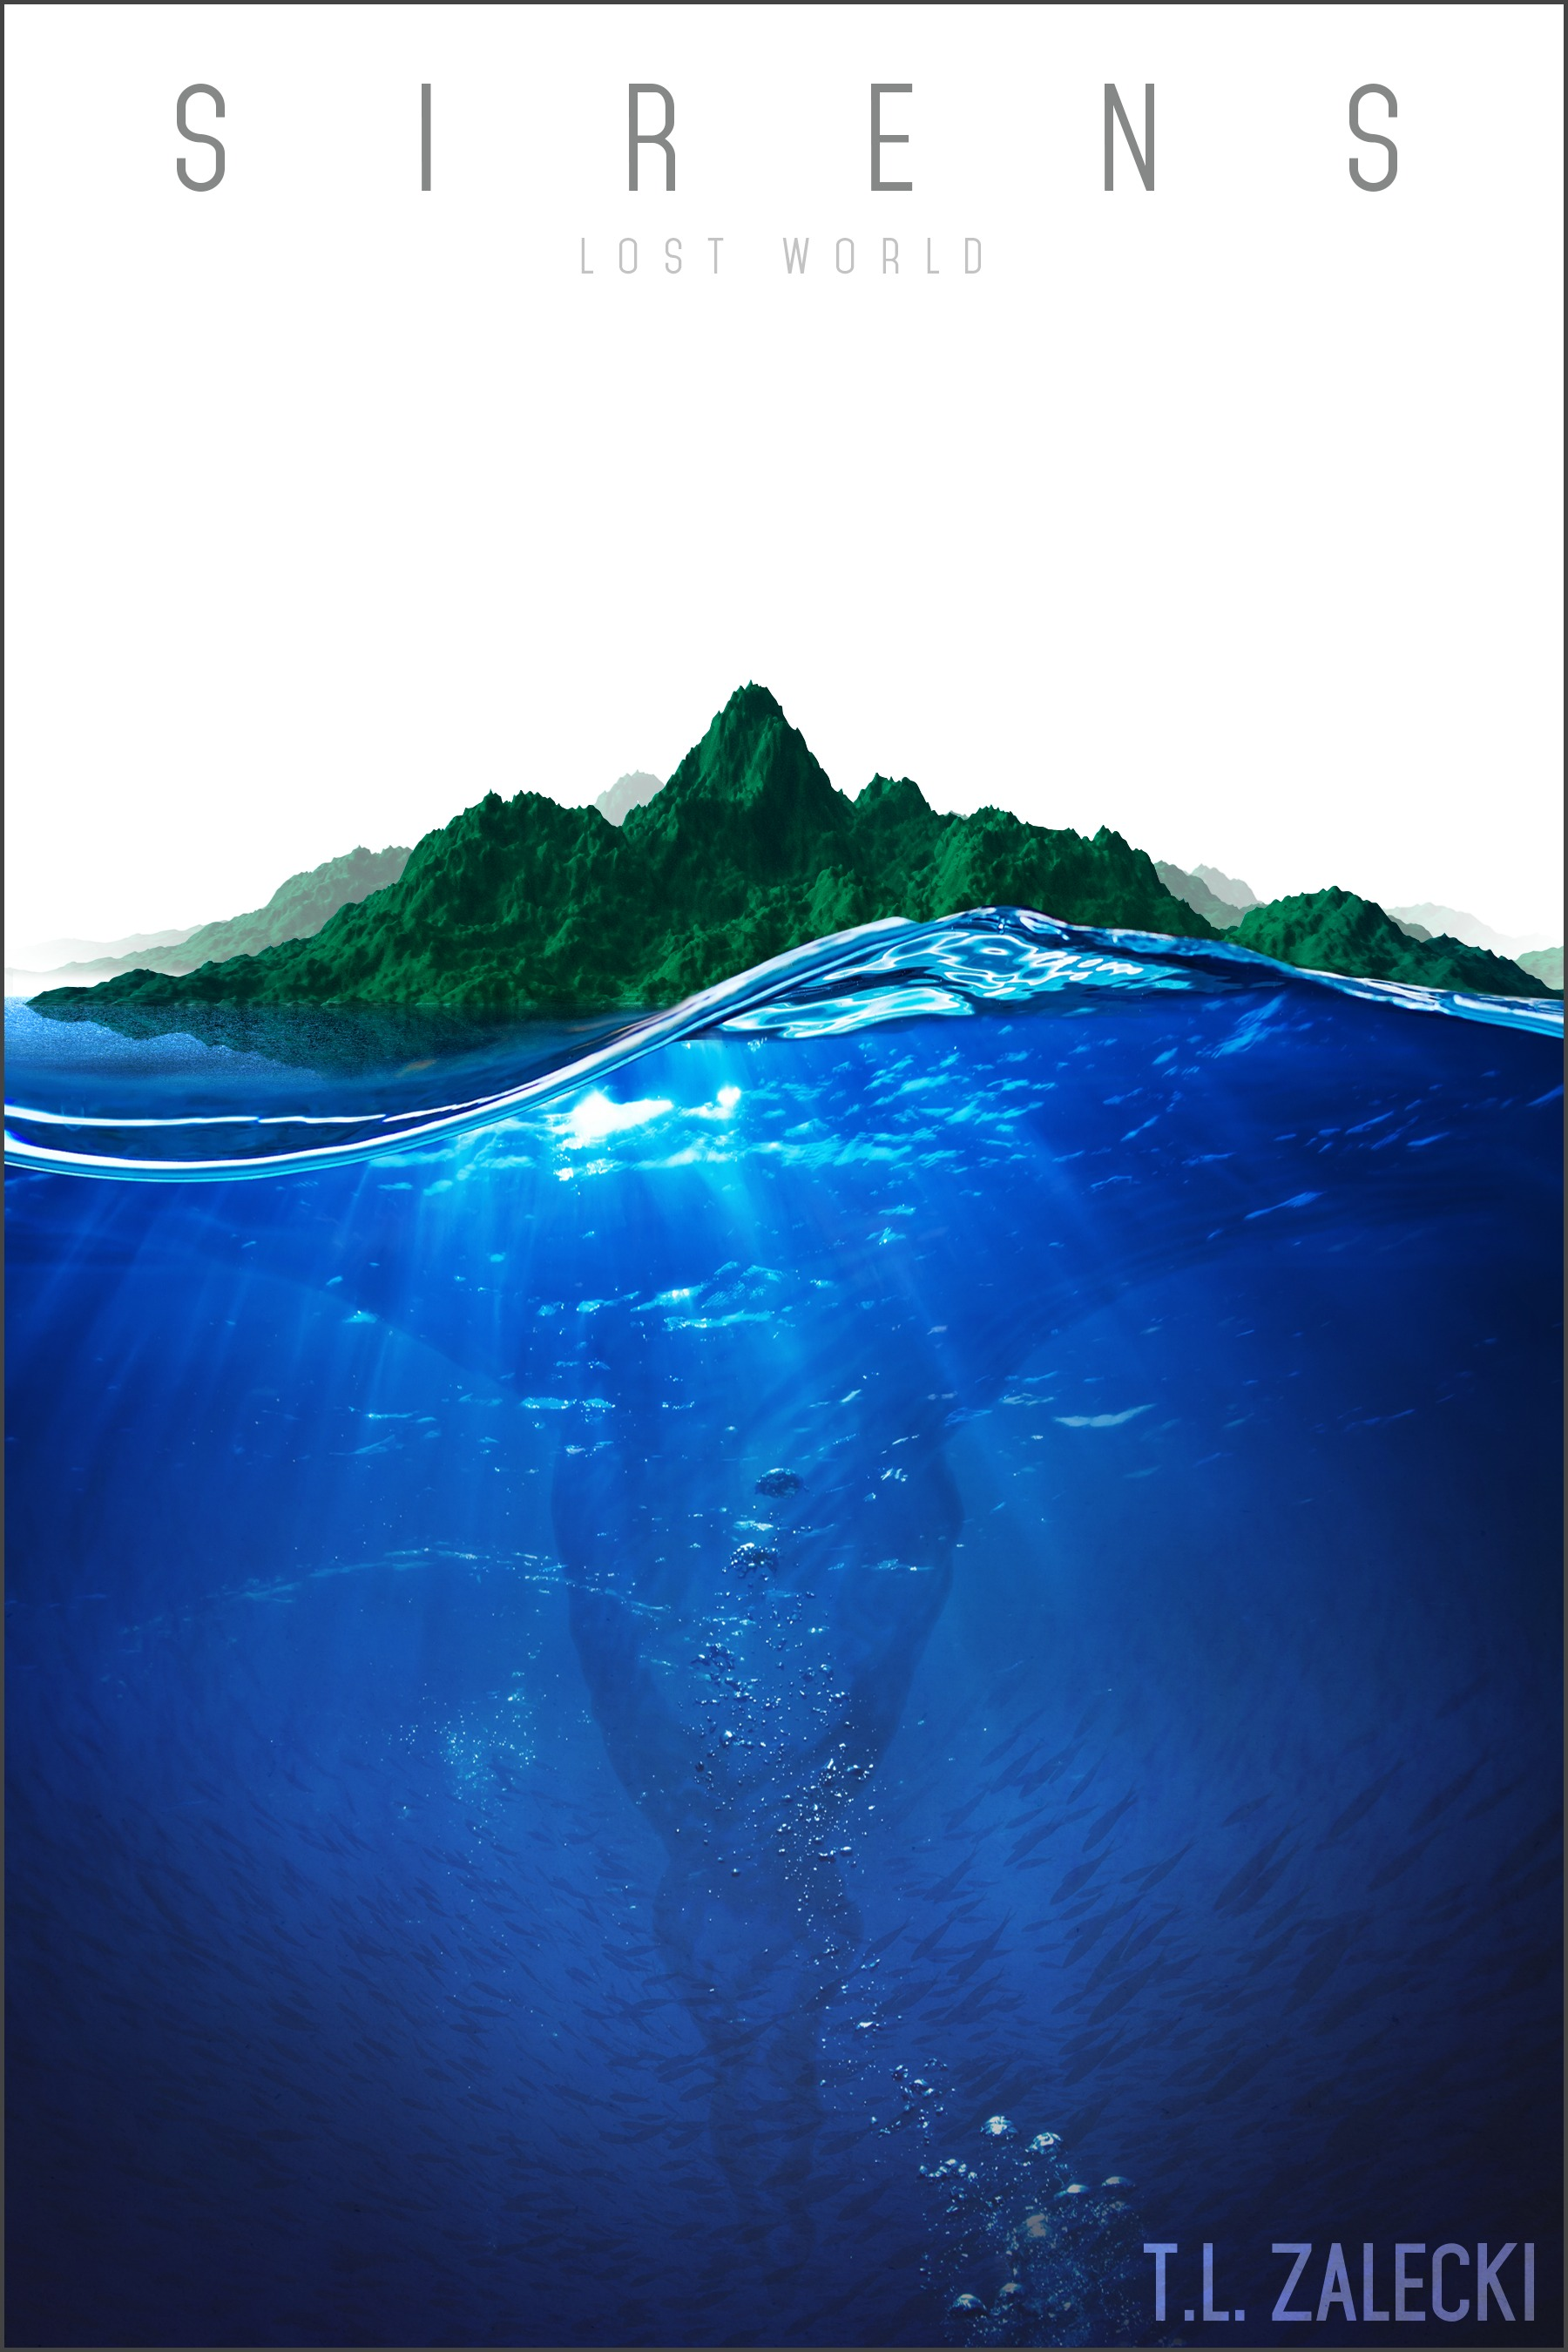 Lost World (SIRENS #2)  by  T.L. Zalecki